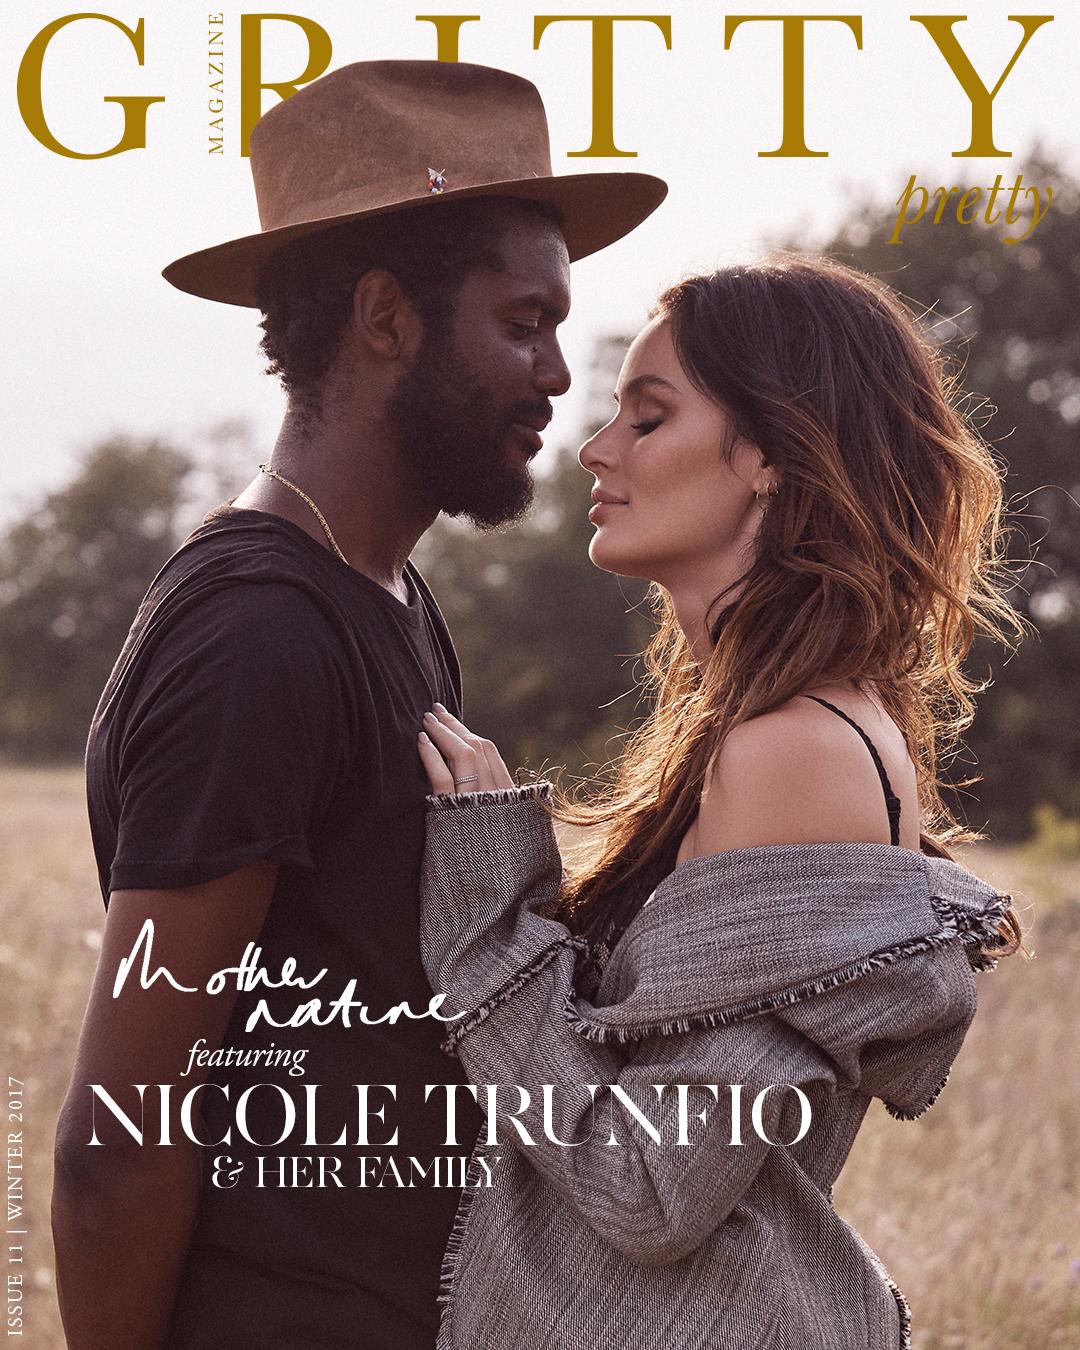 GP_Issue11_NicoleTrunfio_INSTAGRAM_1080x1320px_3.jpg